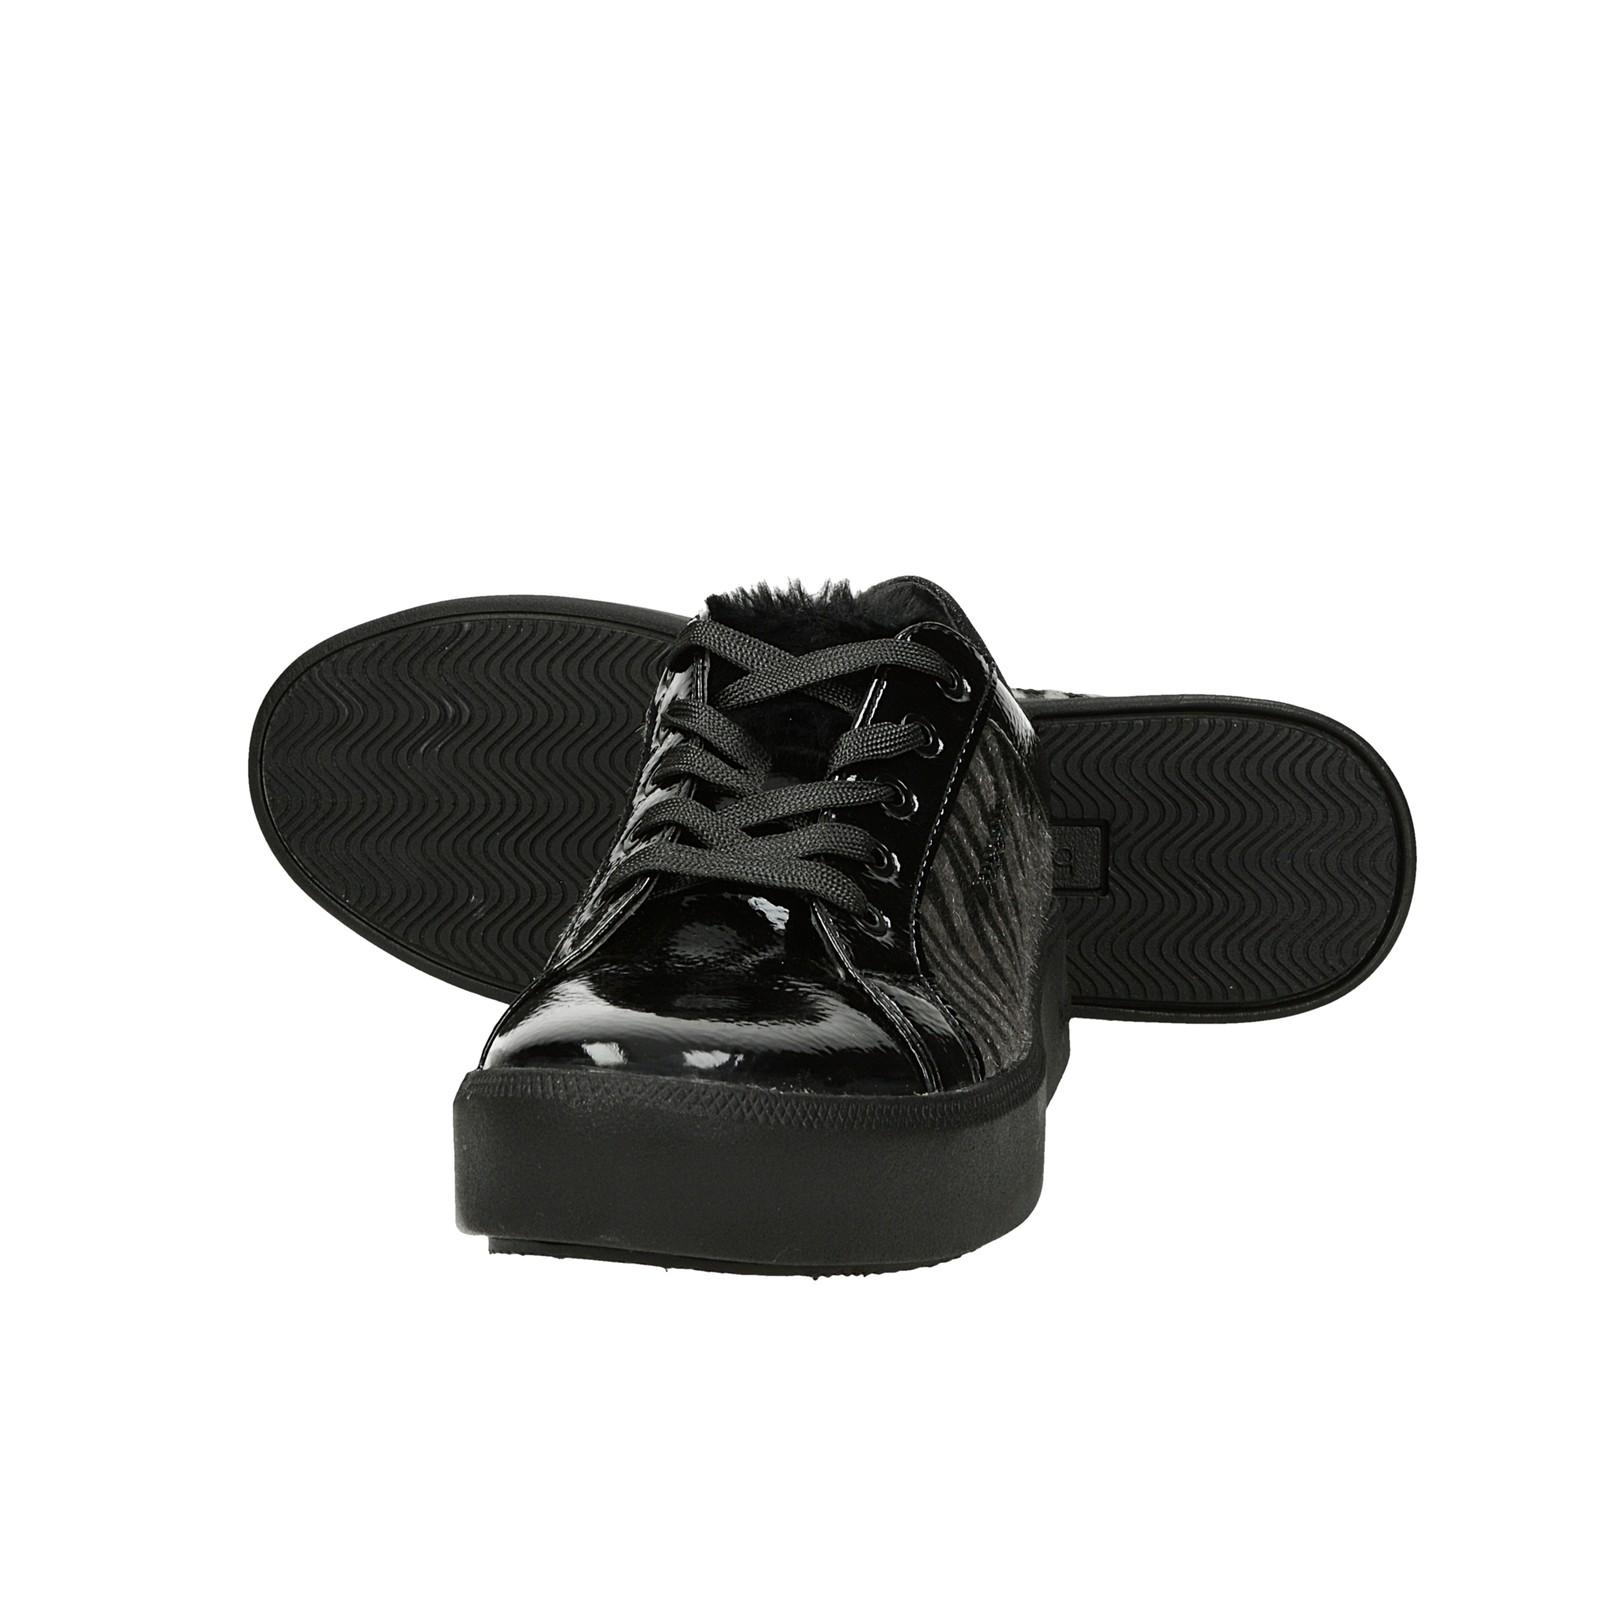 Bugatti dámske štýlové tenisky - čierne